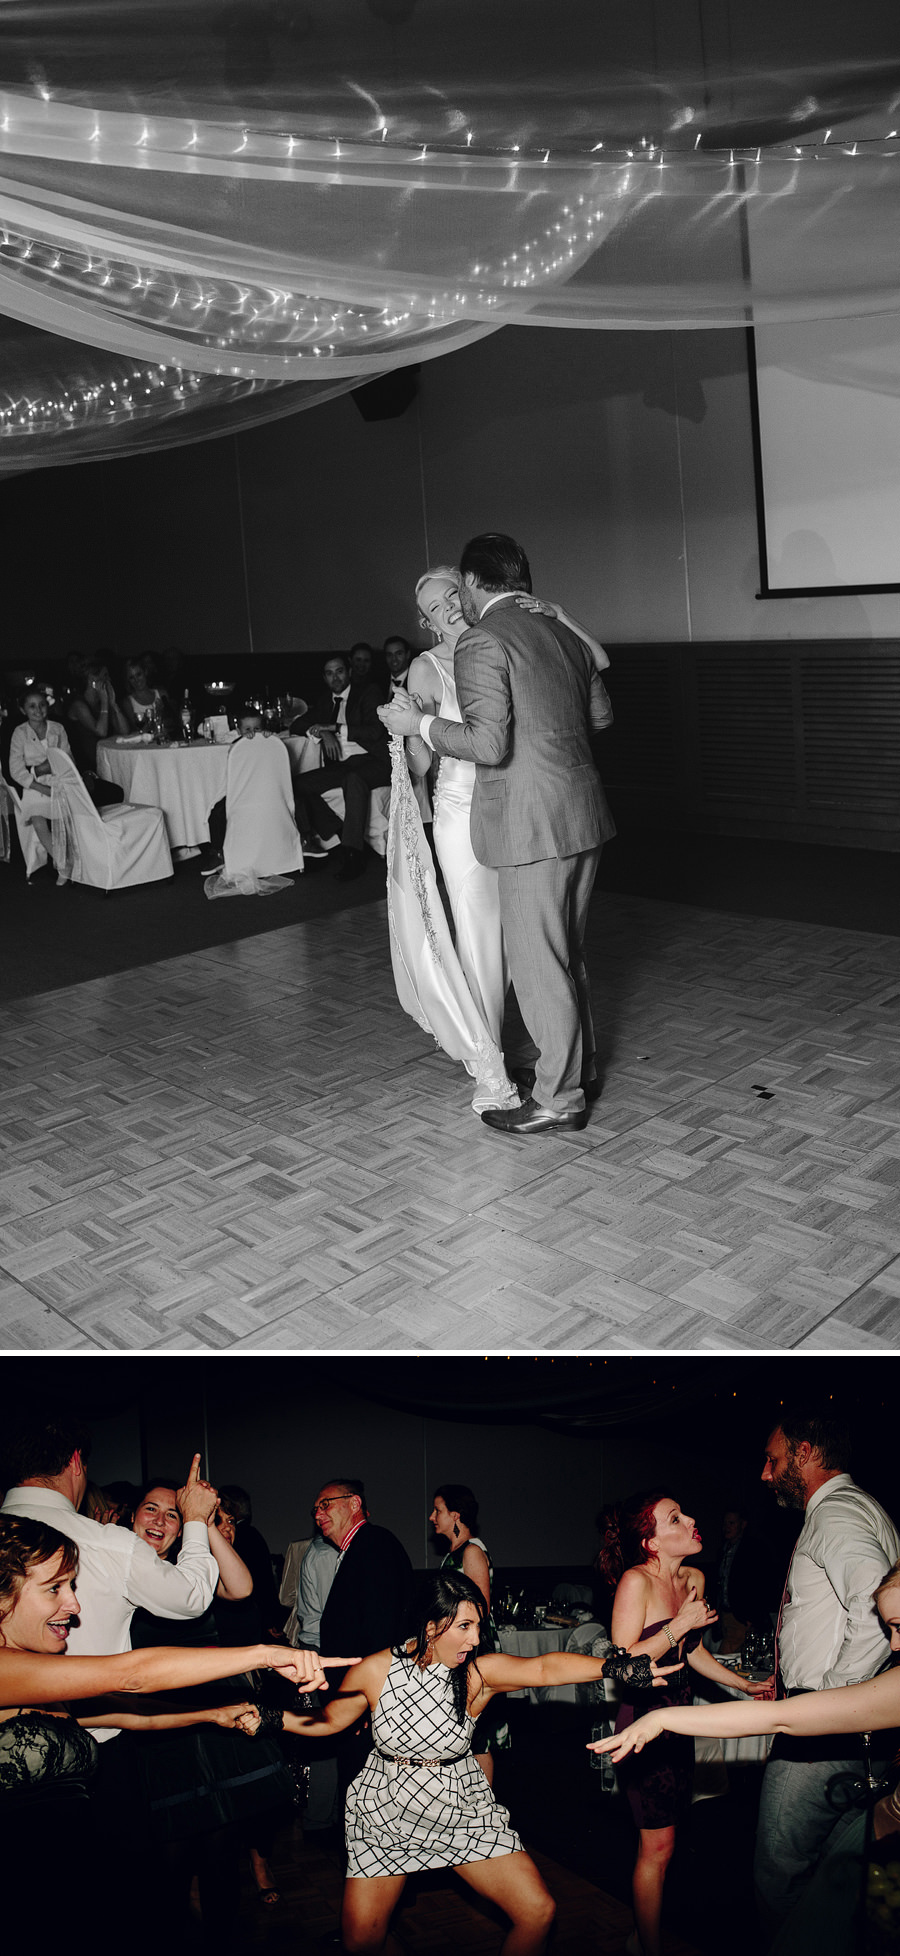 IMAX Wedding Photographer: Bridal waltz